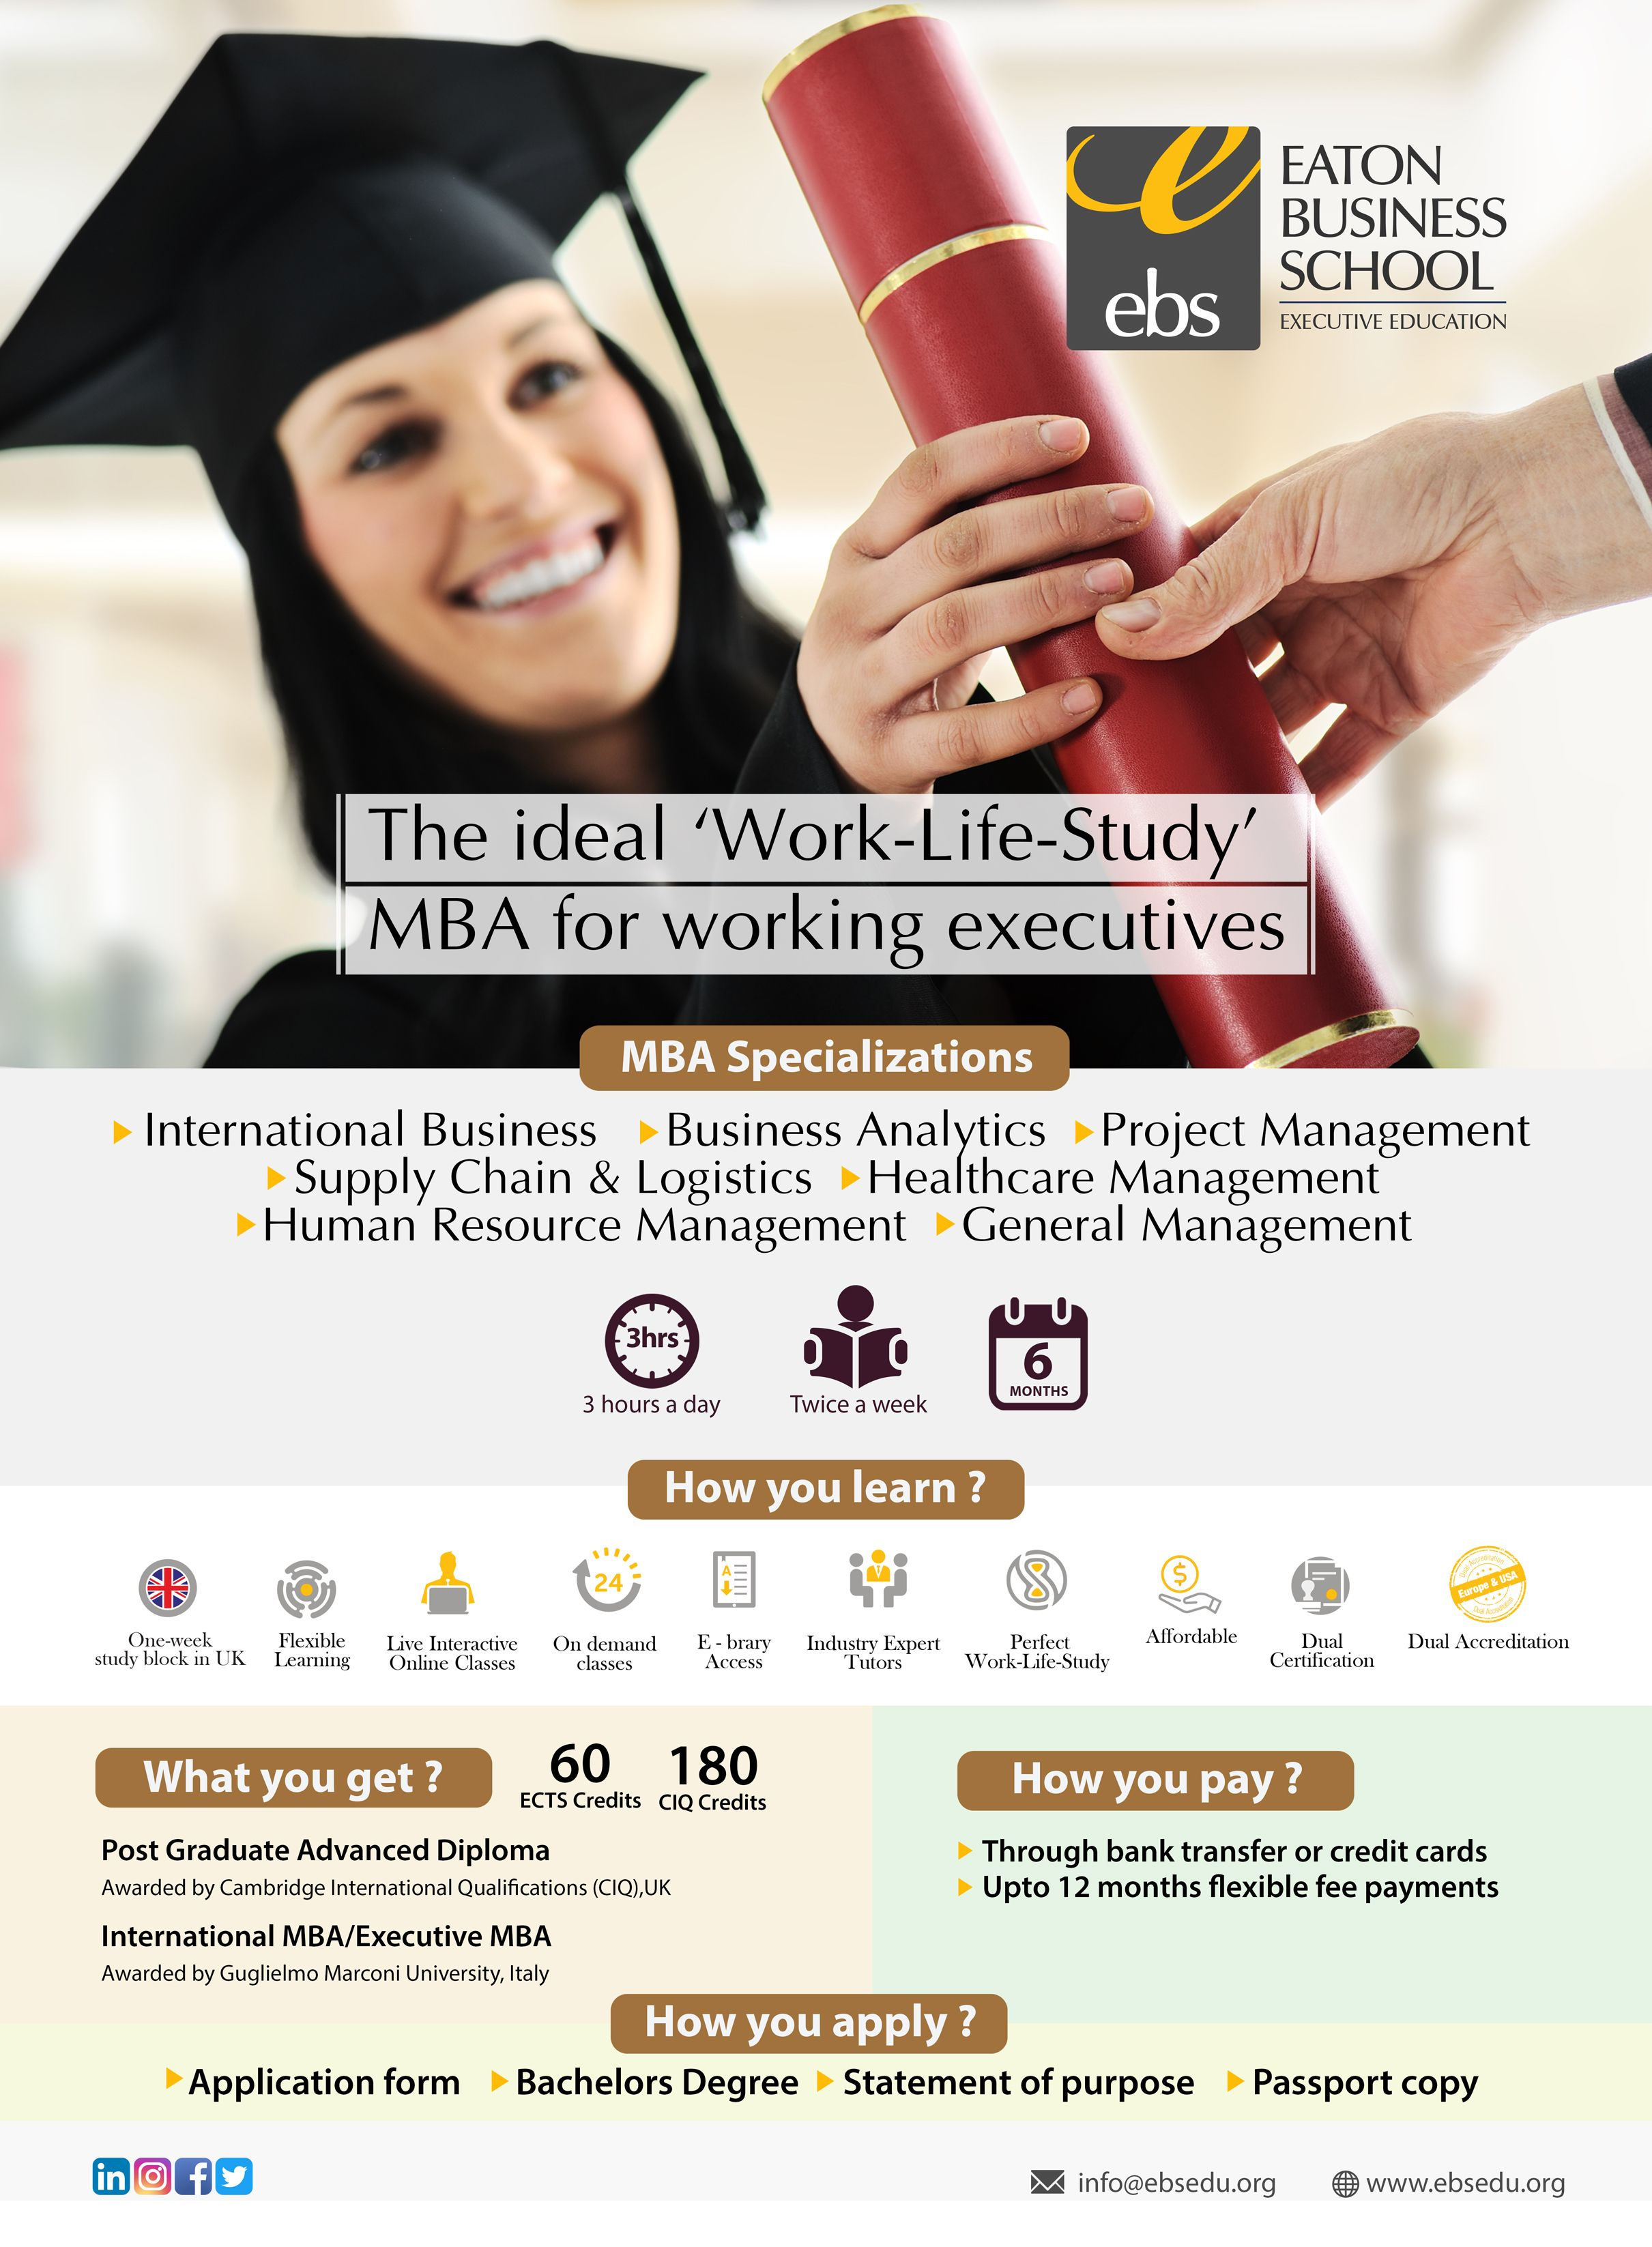 Eaton Business School Ebs In Partnership With Guglielmo Marconi University Gmu Provides The Intern Business School Executive Education Logistics Management